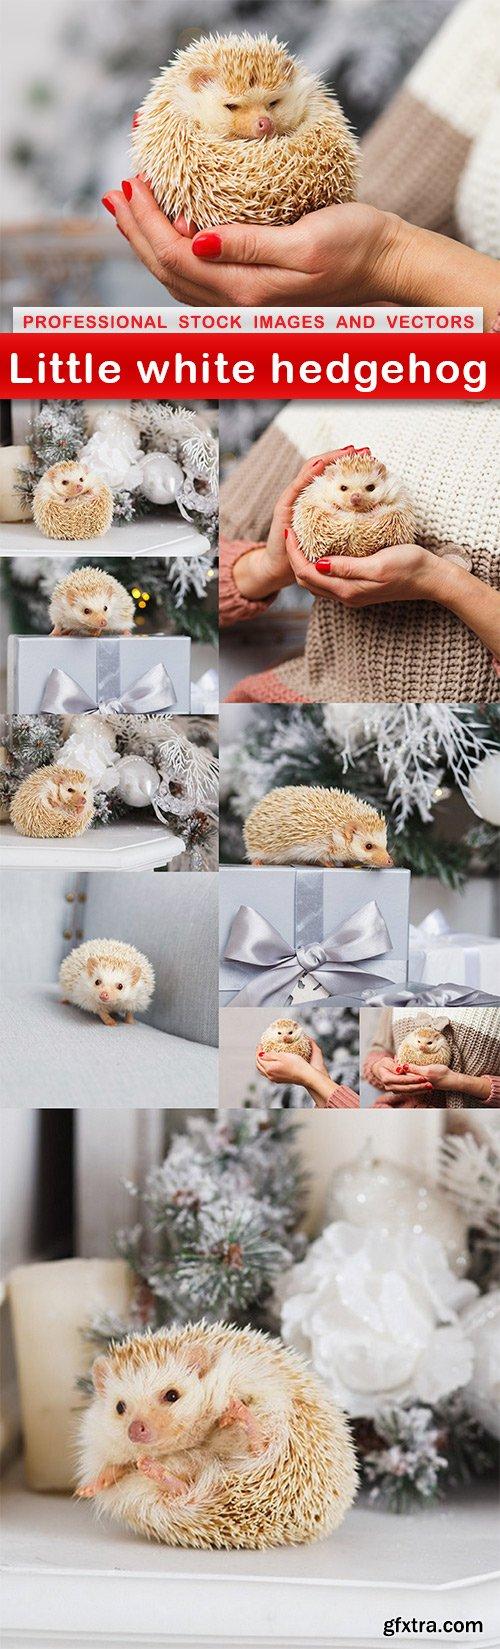 Little white hedgehog - 10 UHQ JPEG